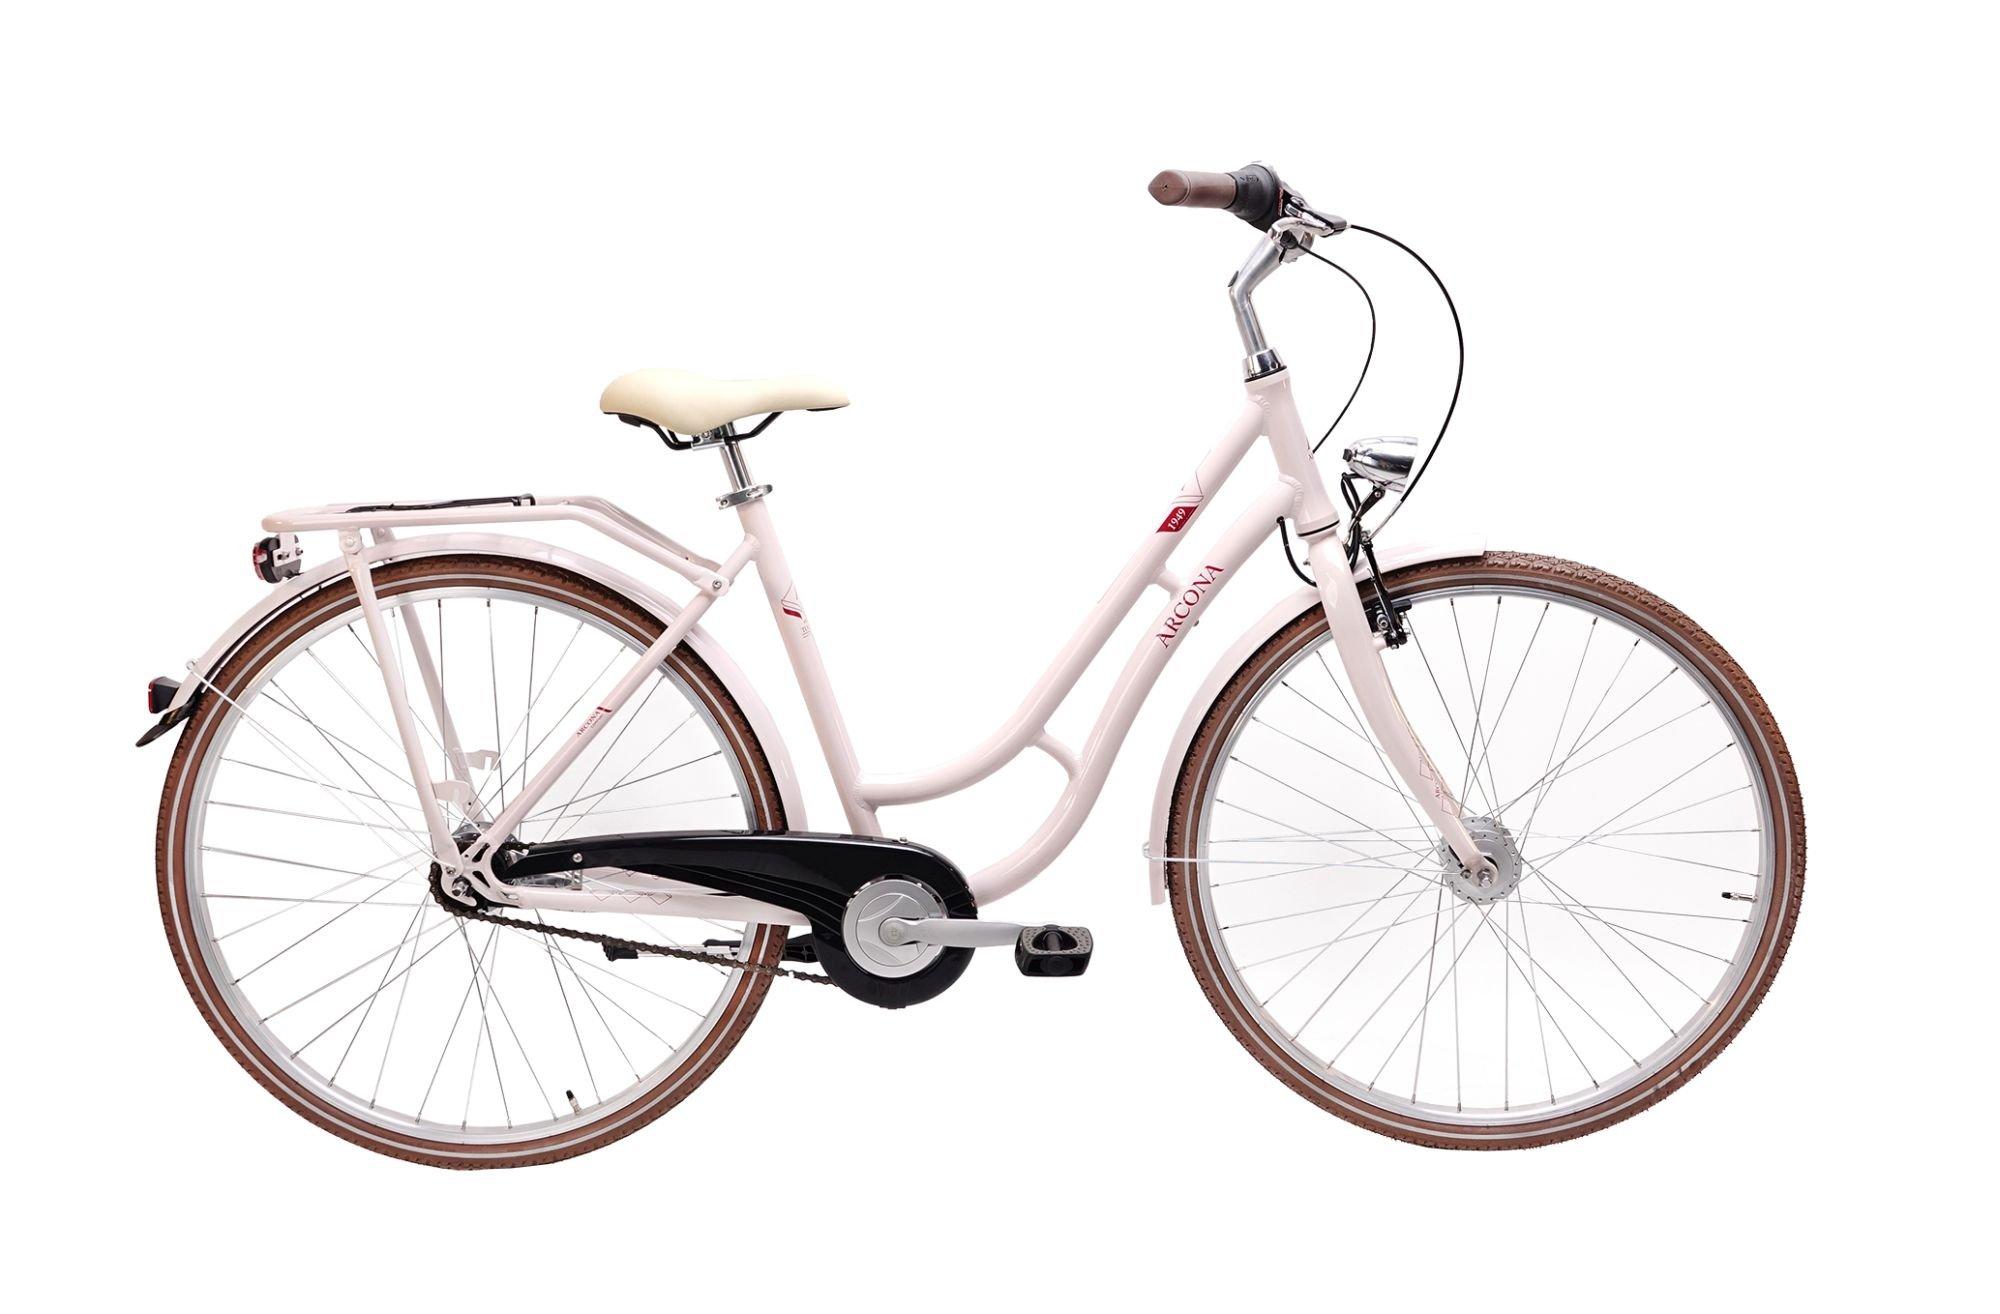 city-/tourenräder/Citybikes: ARCONA  1949 7 Gang Nabenschaltung Damenfahrrad Tourensport Modell 2021 28 Zoll 55 cm